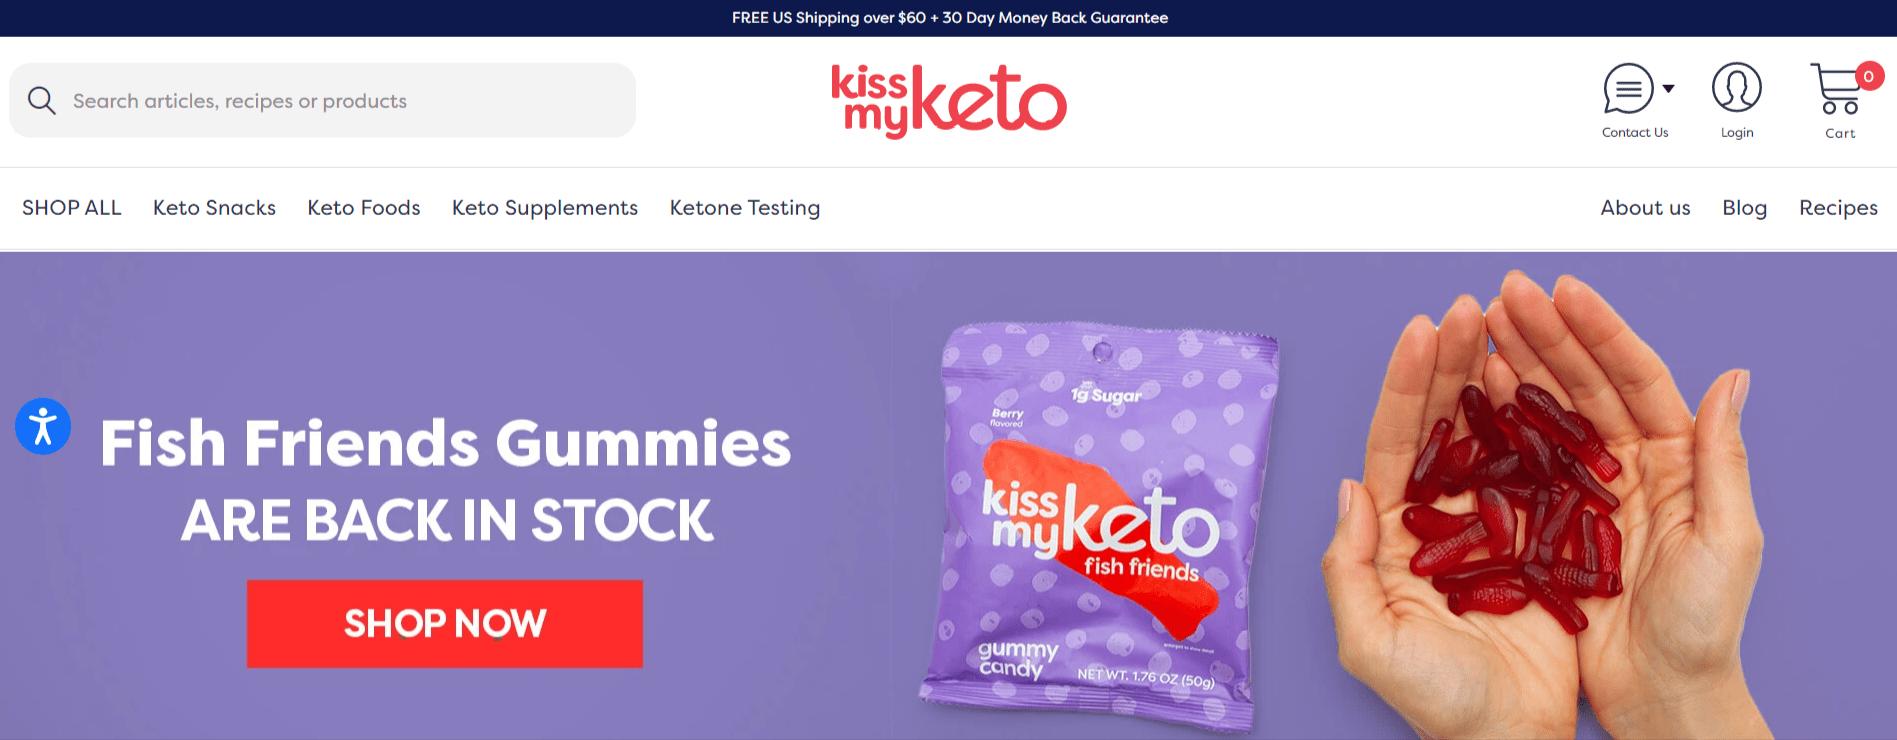 Kissmyketo- Keto Affiliate Programs